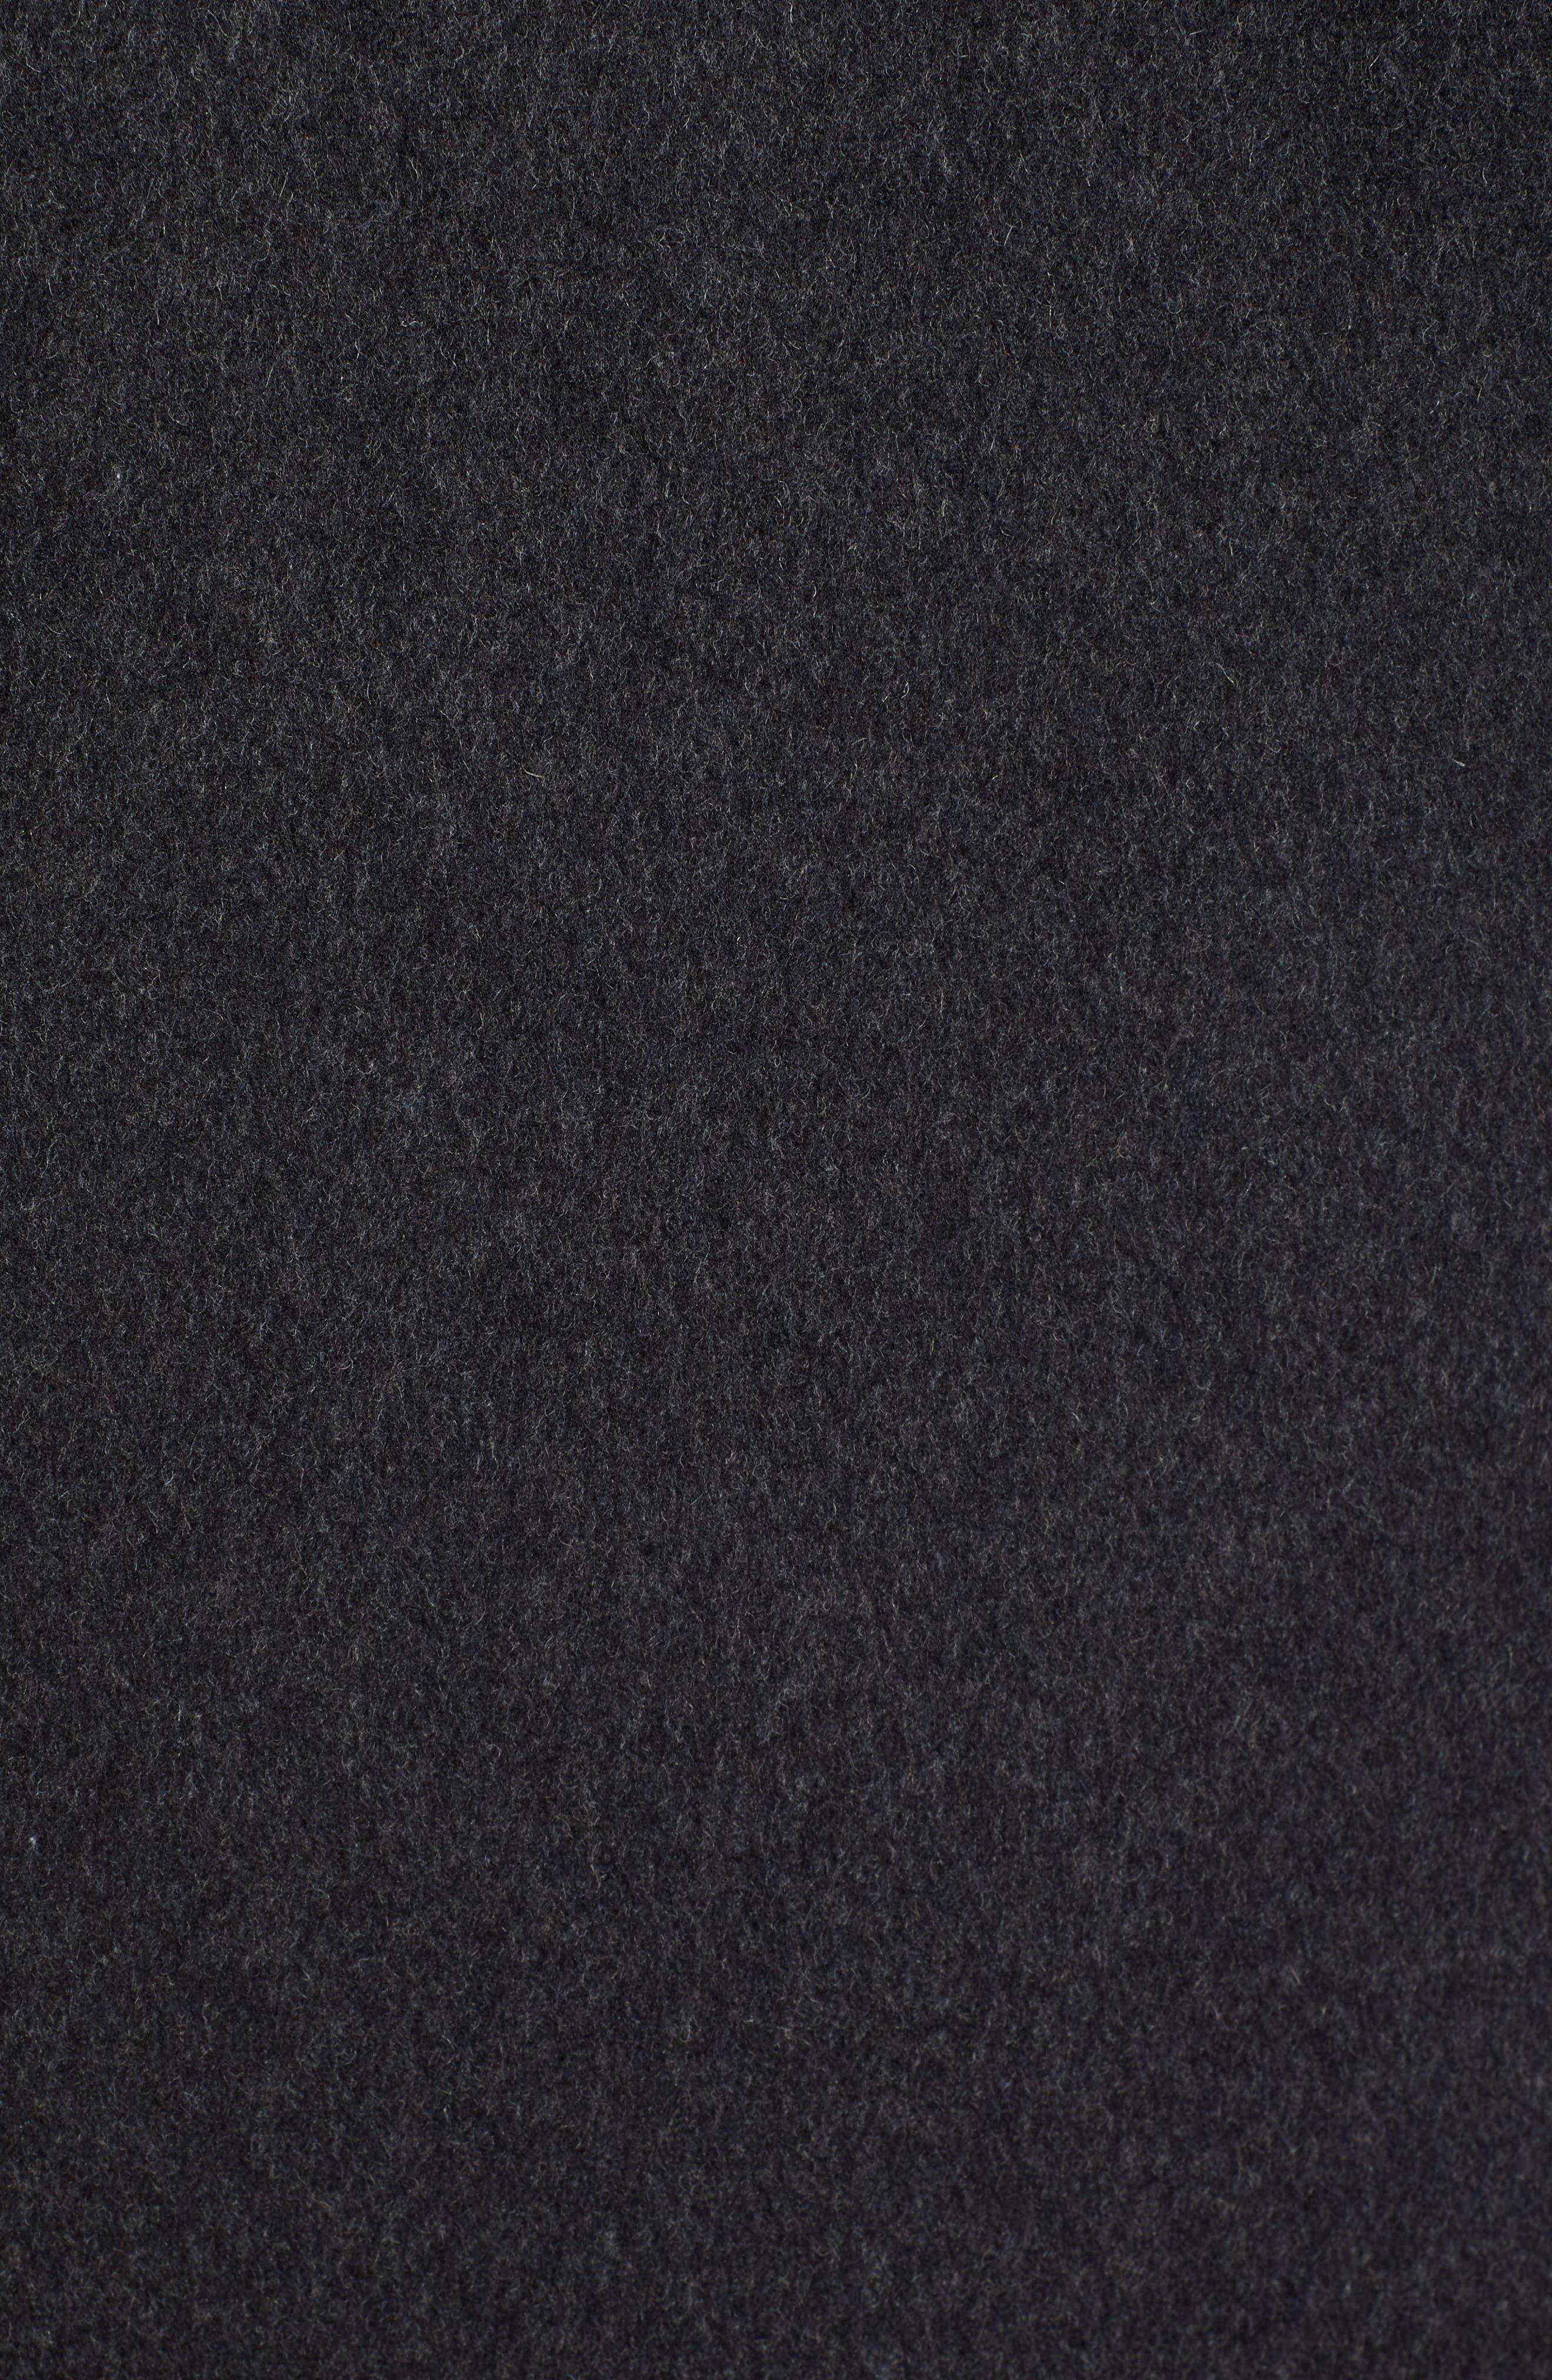 Roslyn Waterproof Lambswool Blend Hooded Coat,                             Alternate thumbnail 7, color,                             CHARCOAL